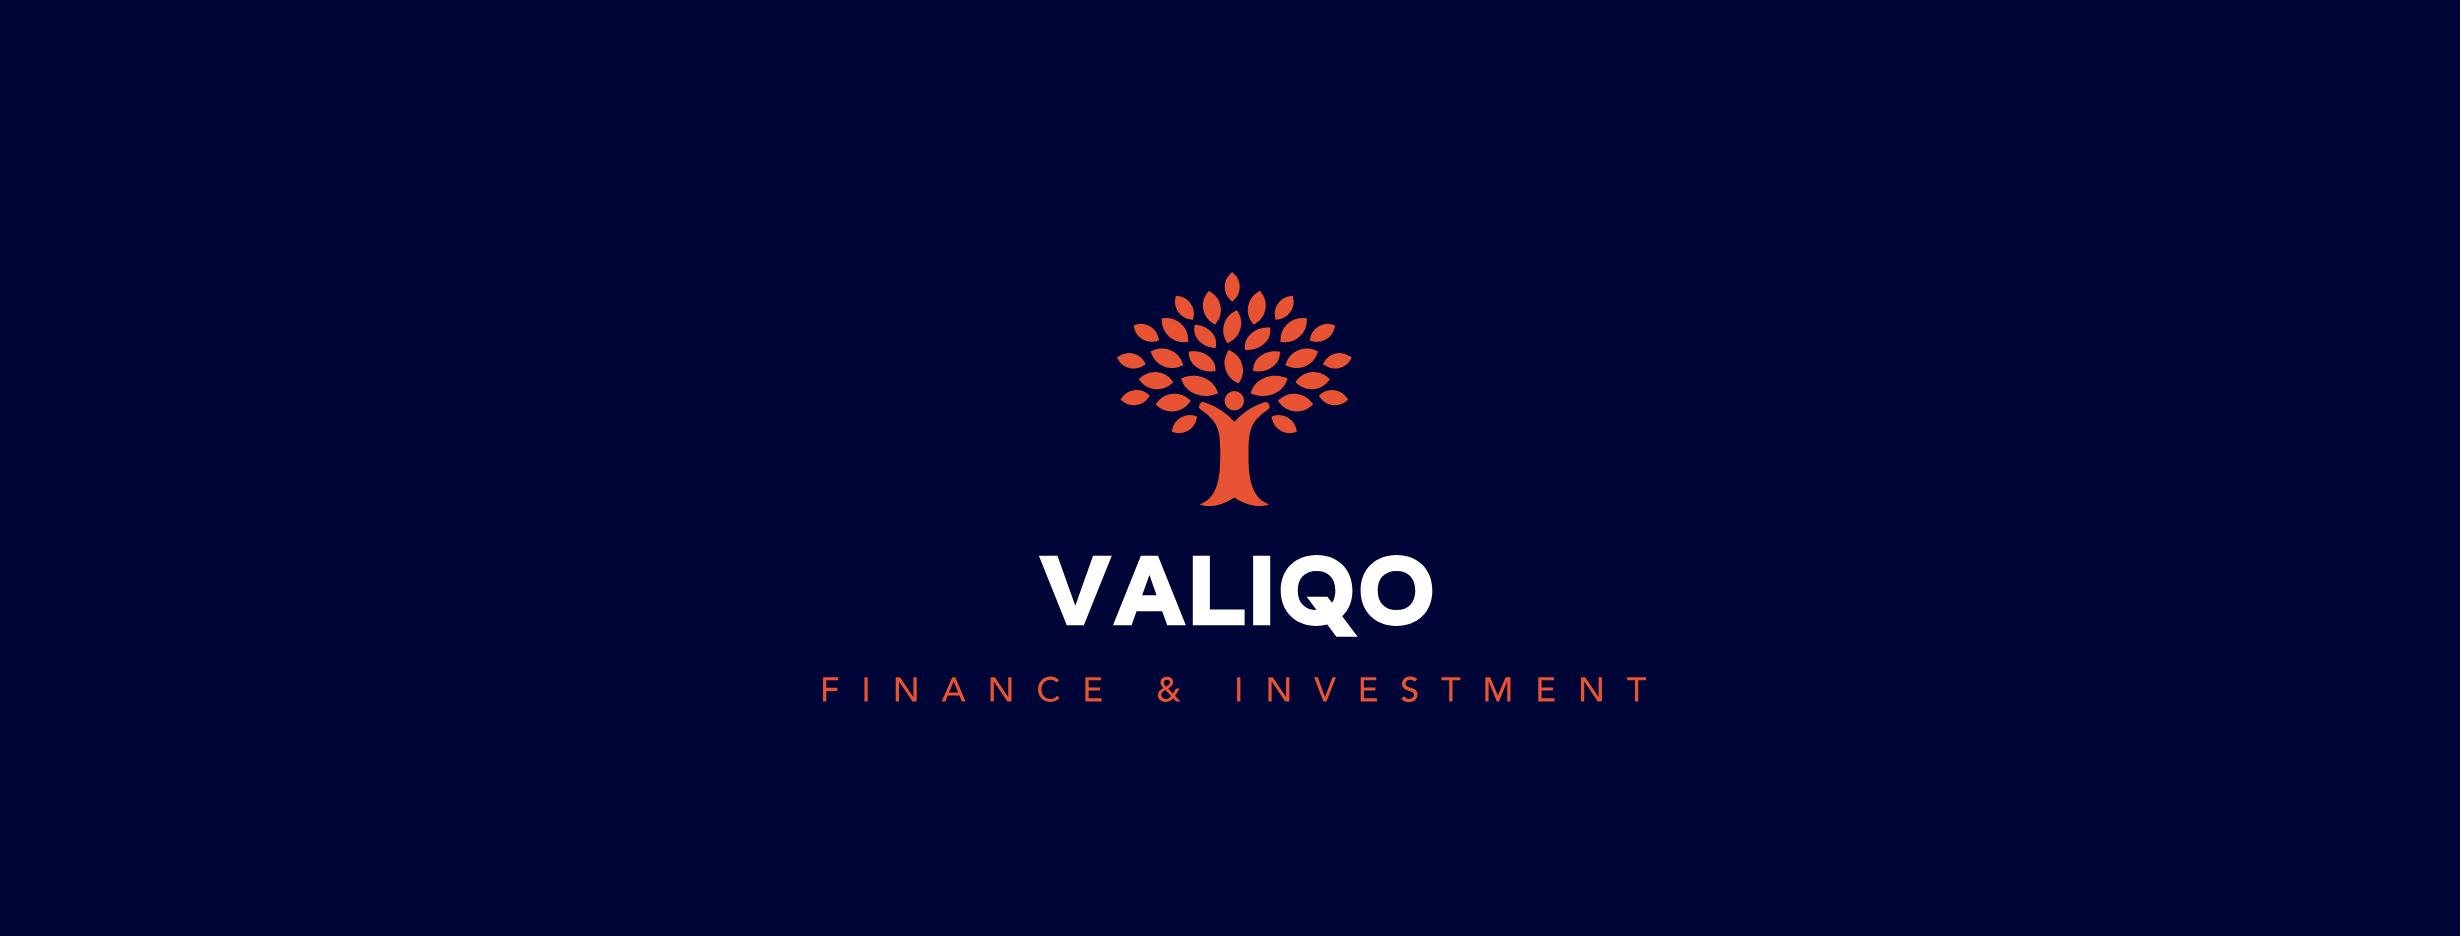 Logo Of P2P Comparison Site Valiqo